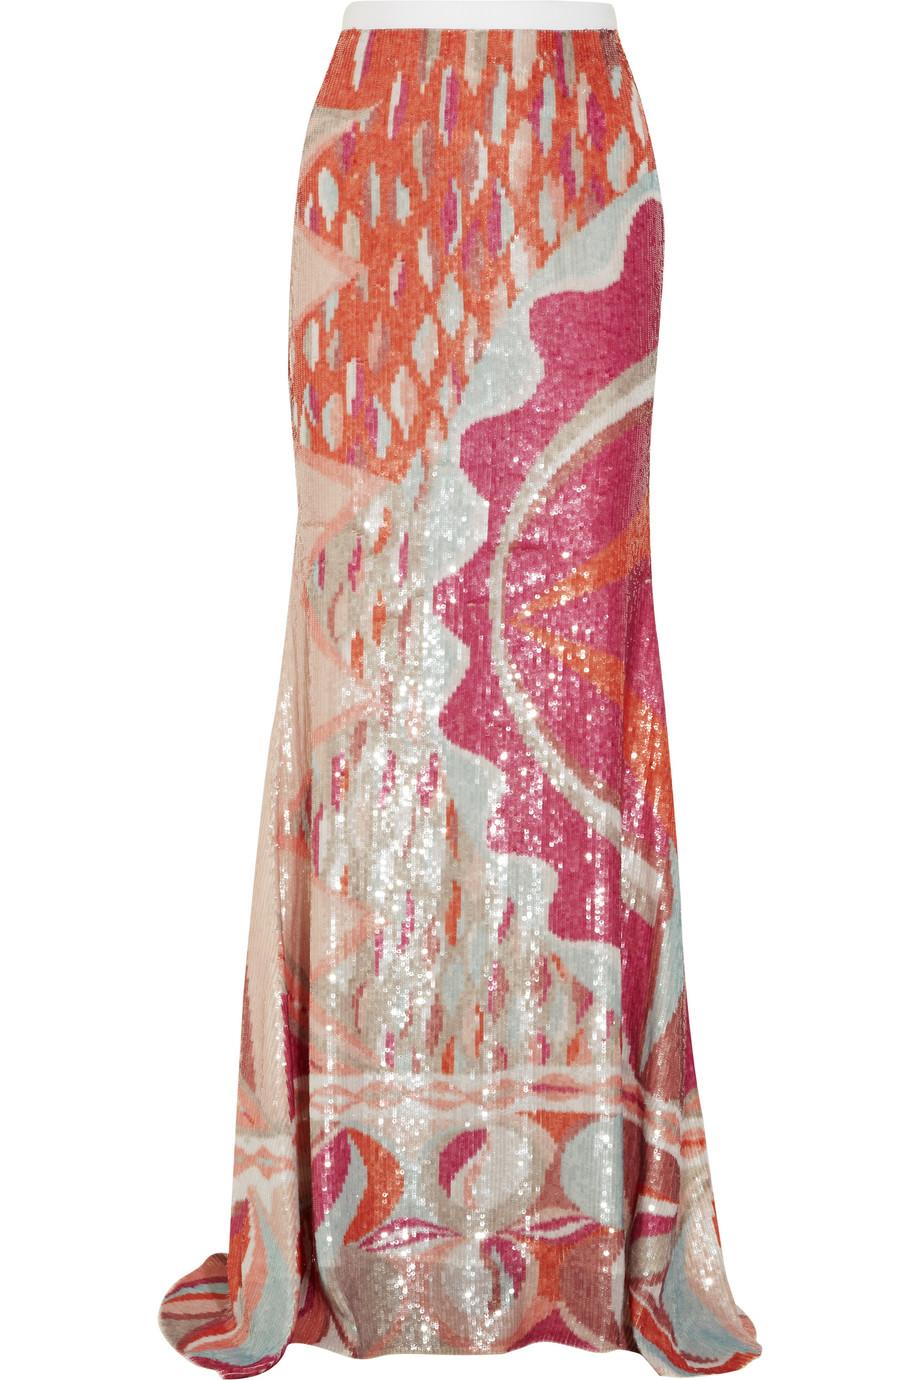 Emilio pucci Sequined Silk Maxi Skirt | Lyst